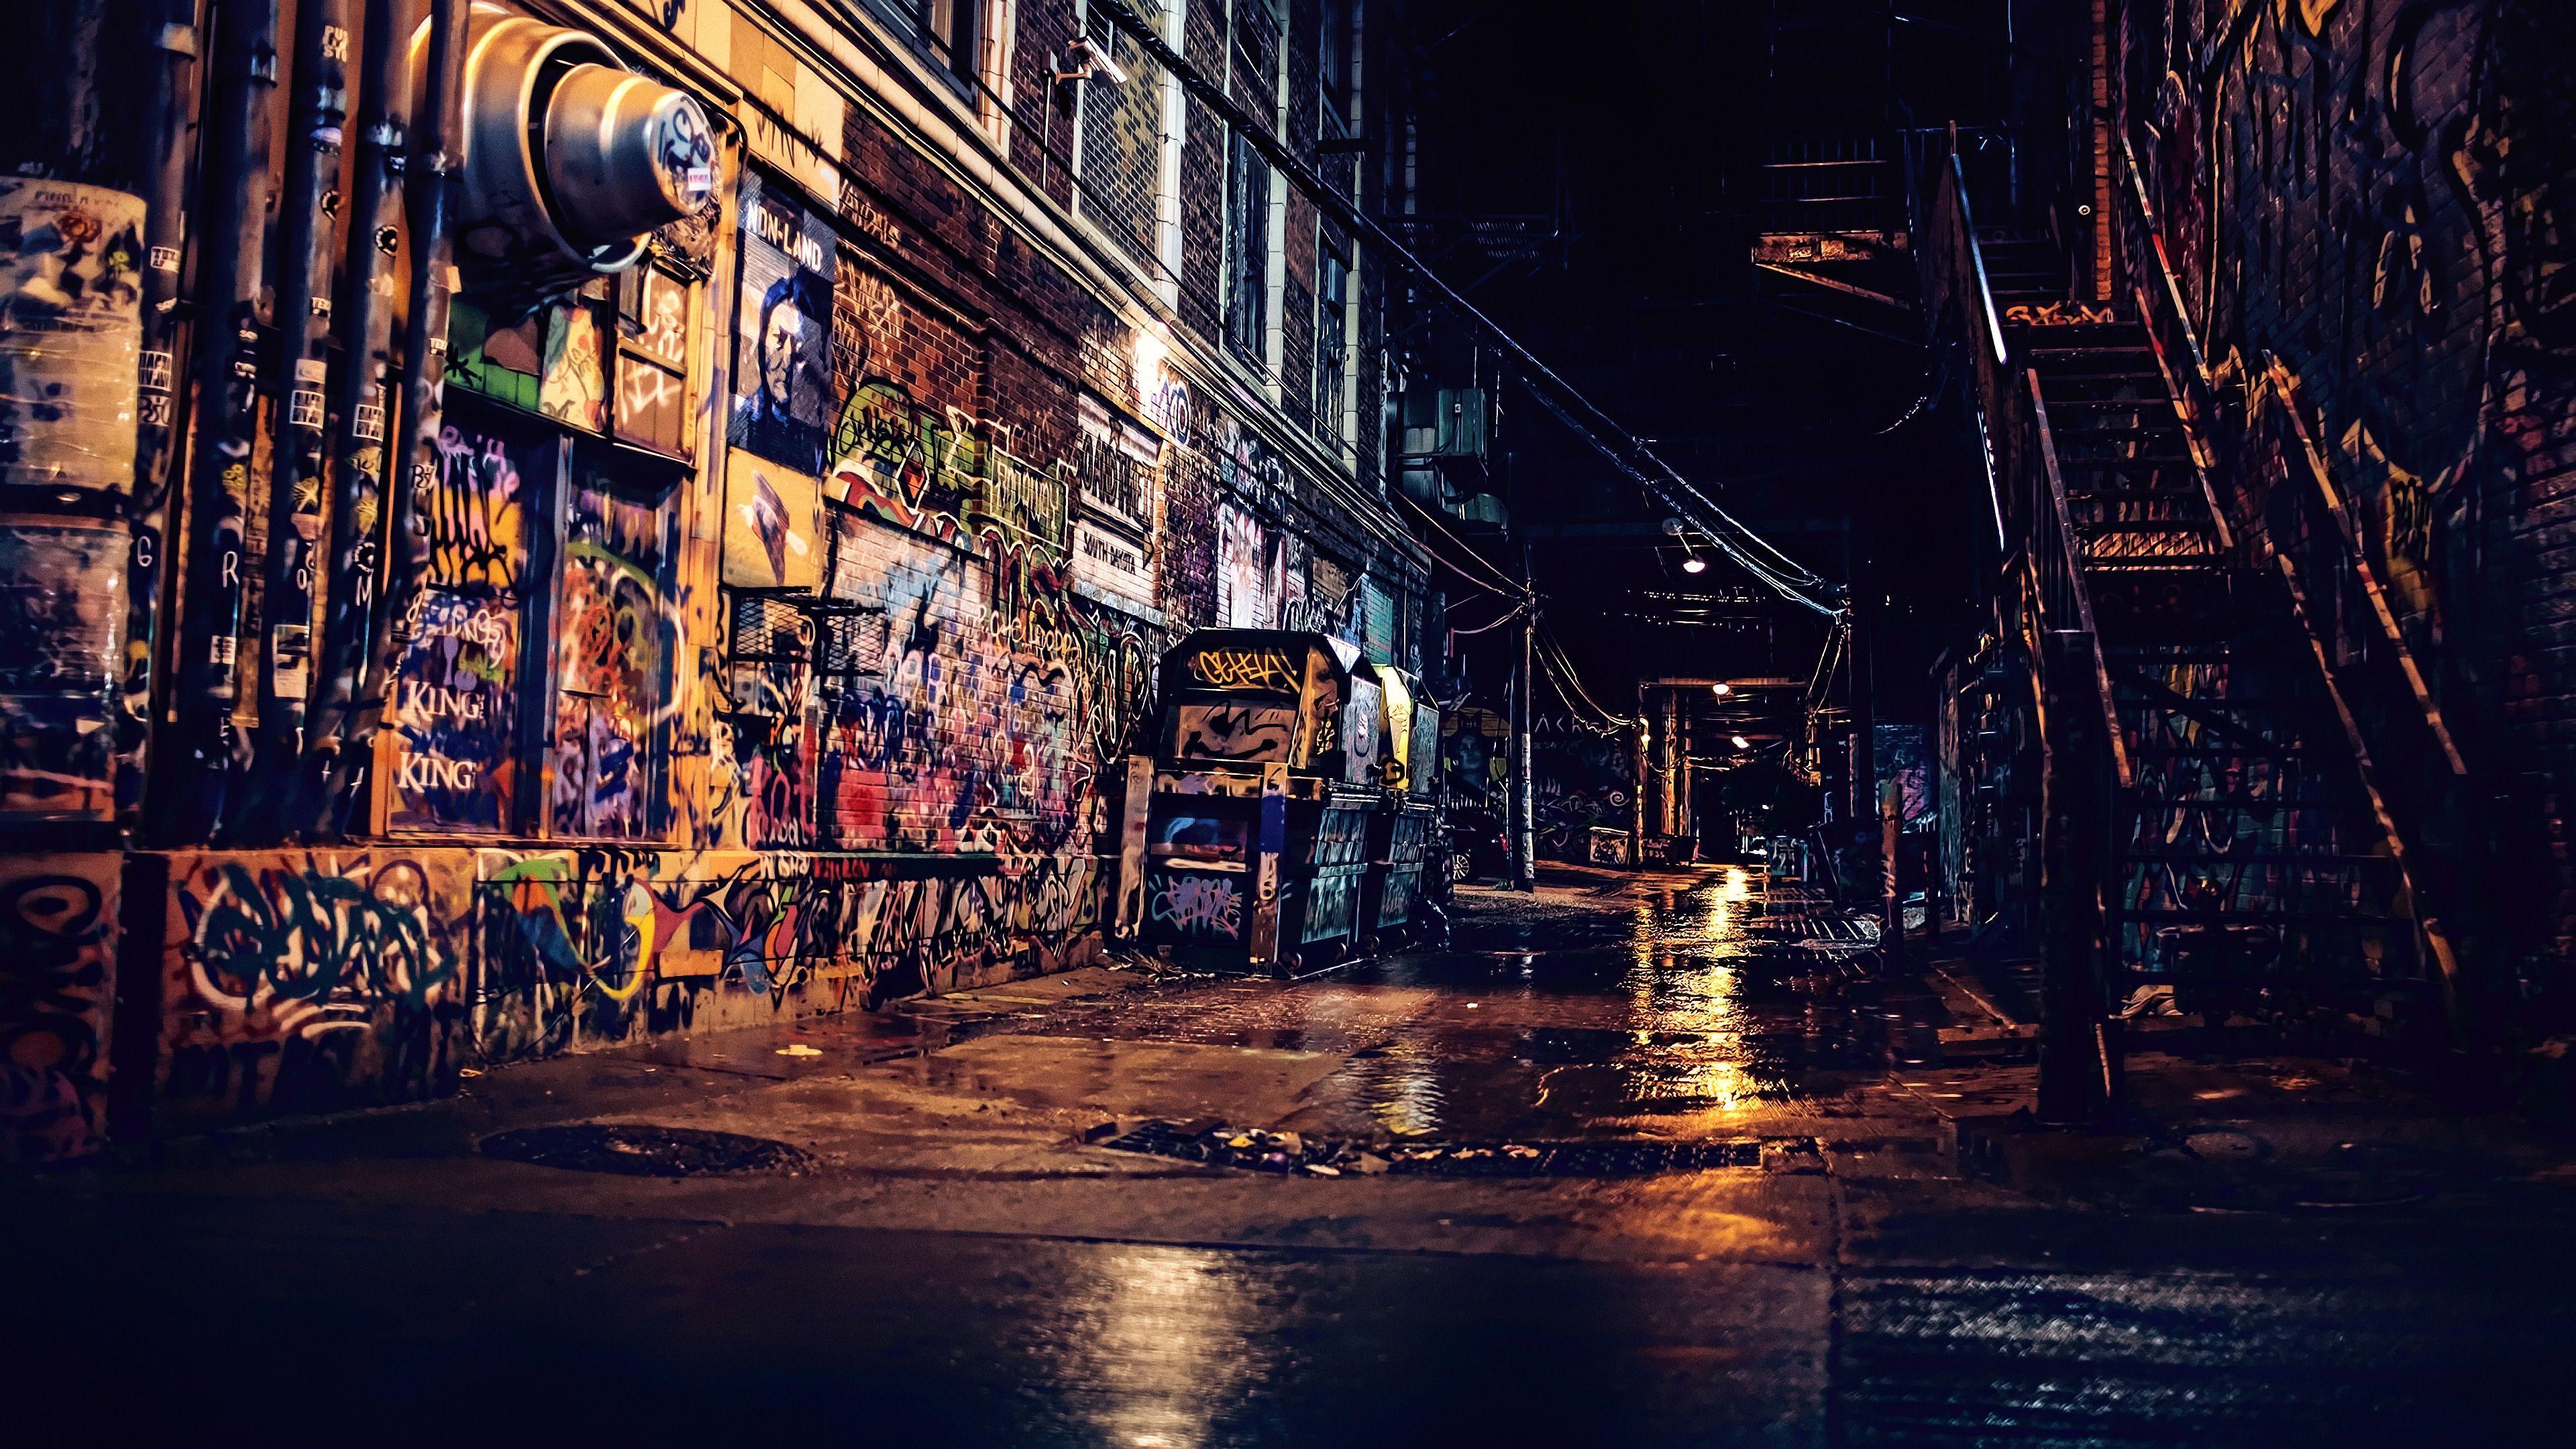 4k Urban Wallpapers Top Free 4k Urban Backgrounds